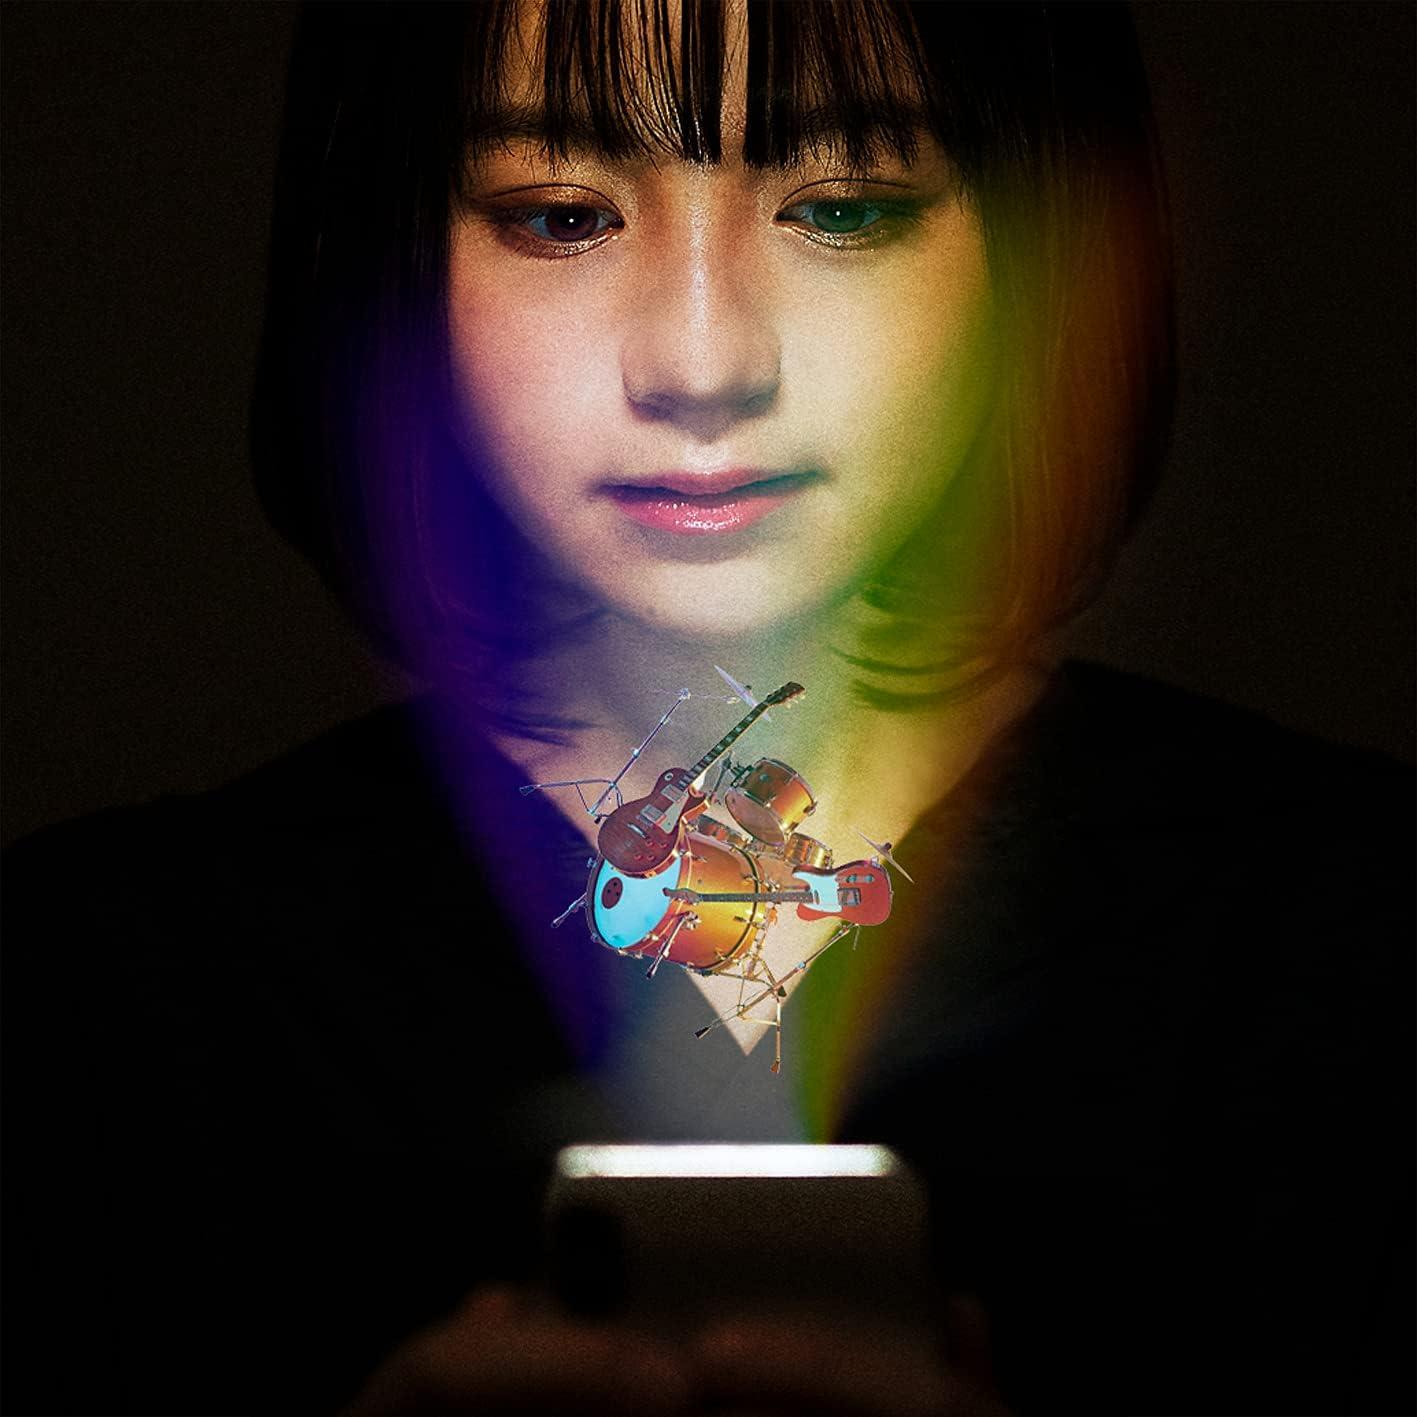 [Single] KANA-BOON – Re:Pray [FLAC 24bit + MP3 320 / WEB]